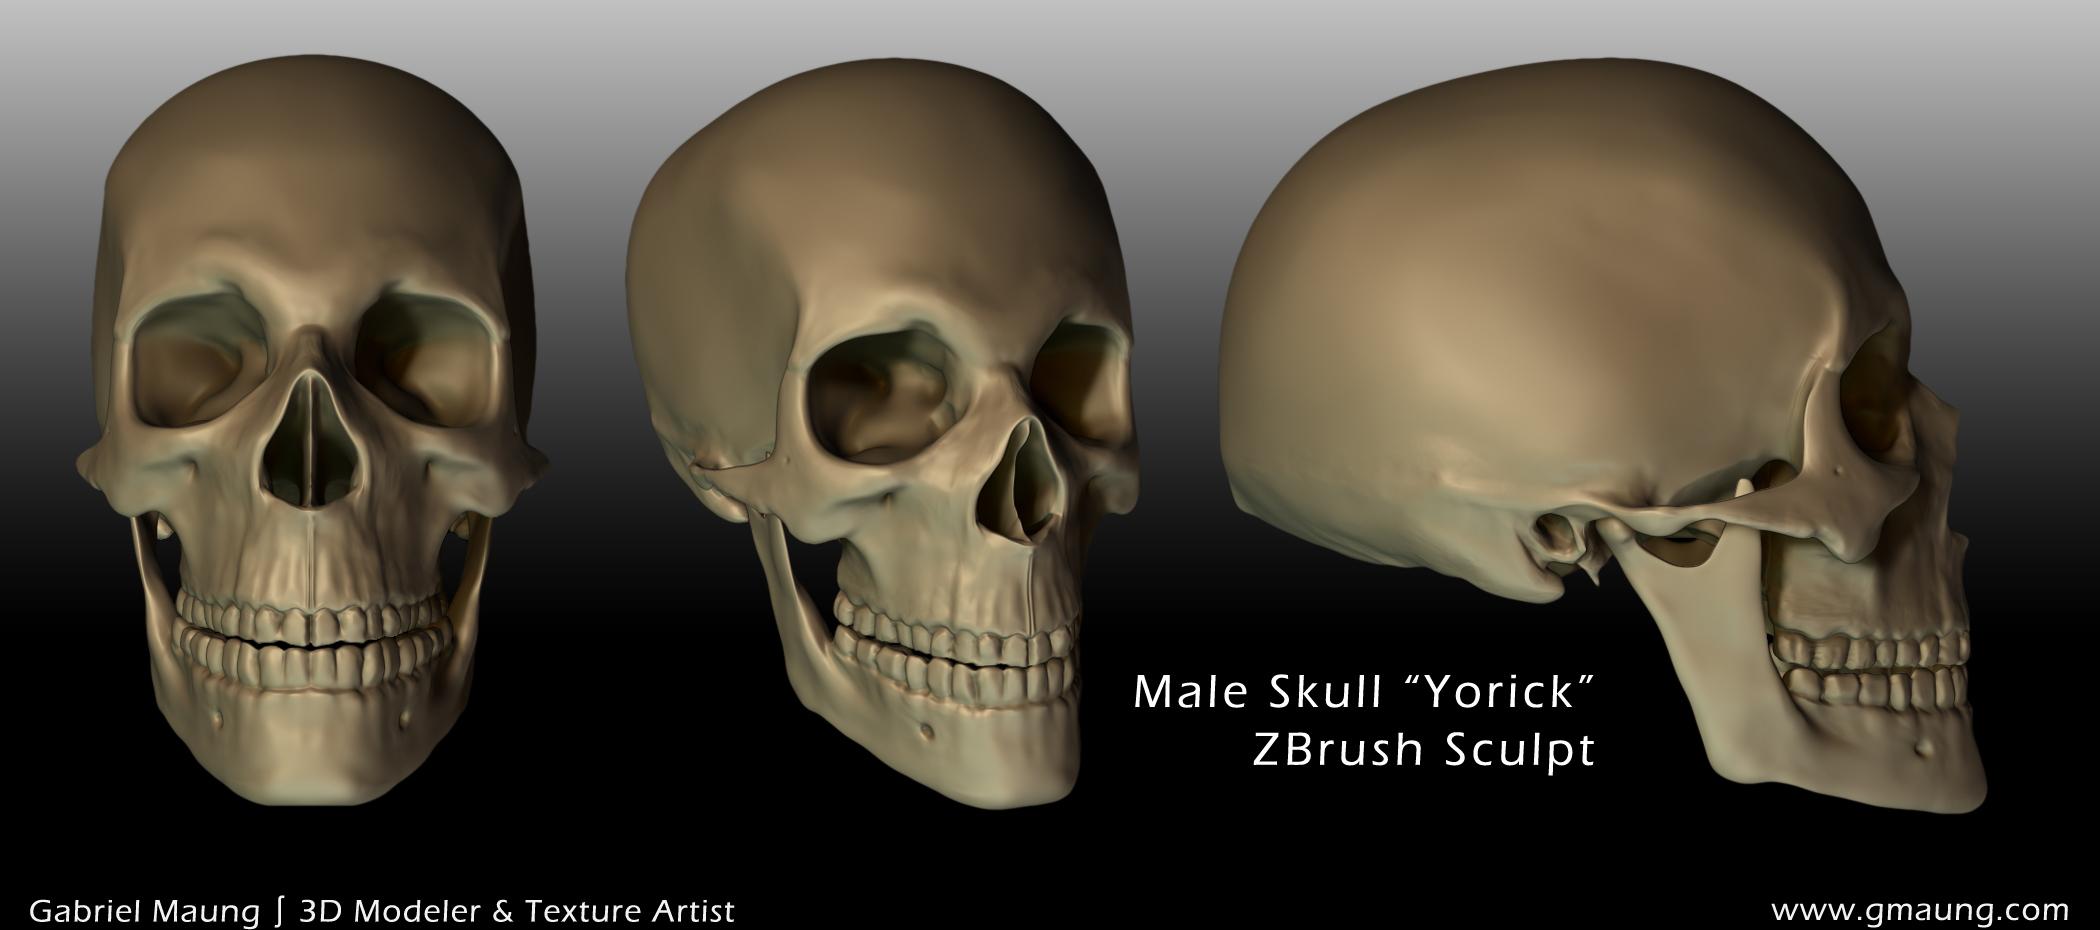 Skull Anterior & Lateral Sides